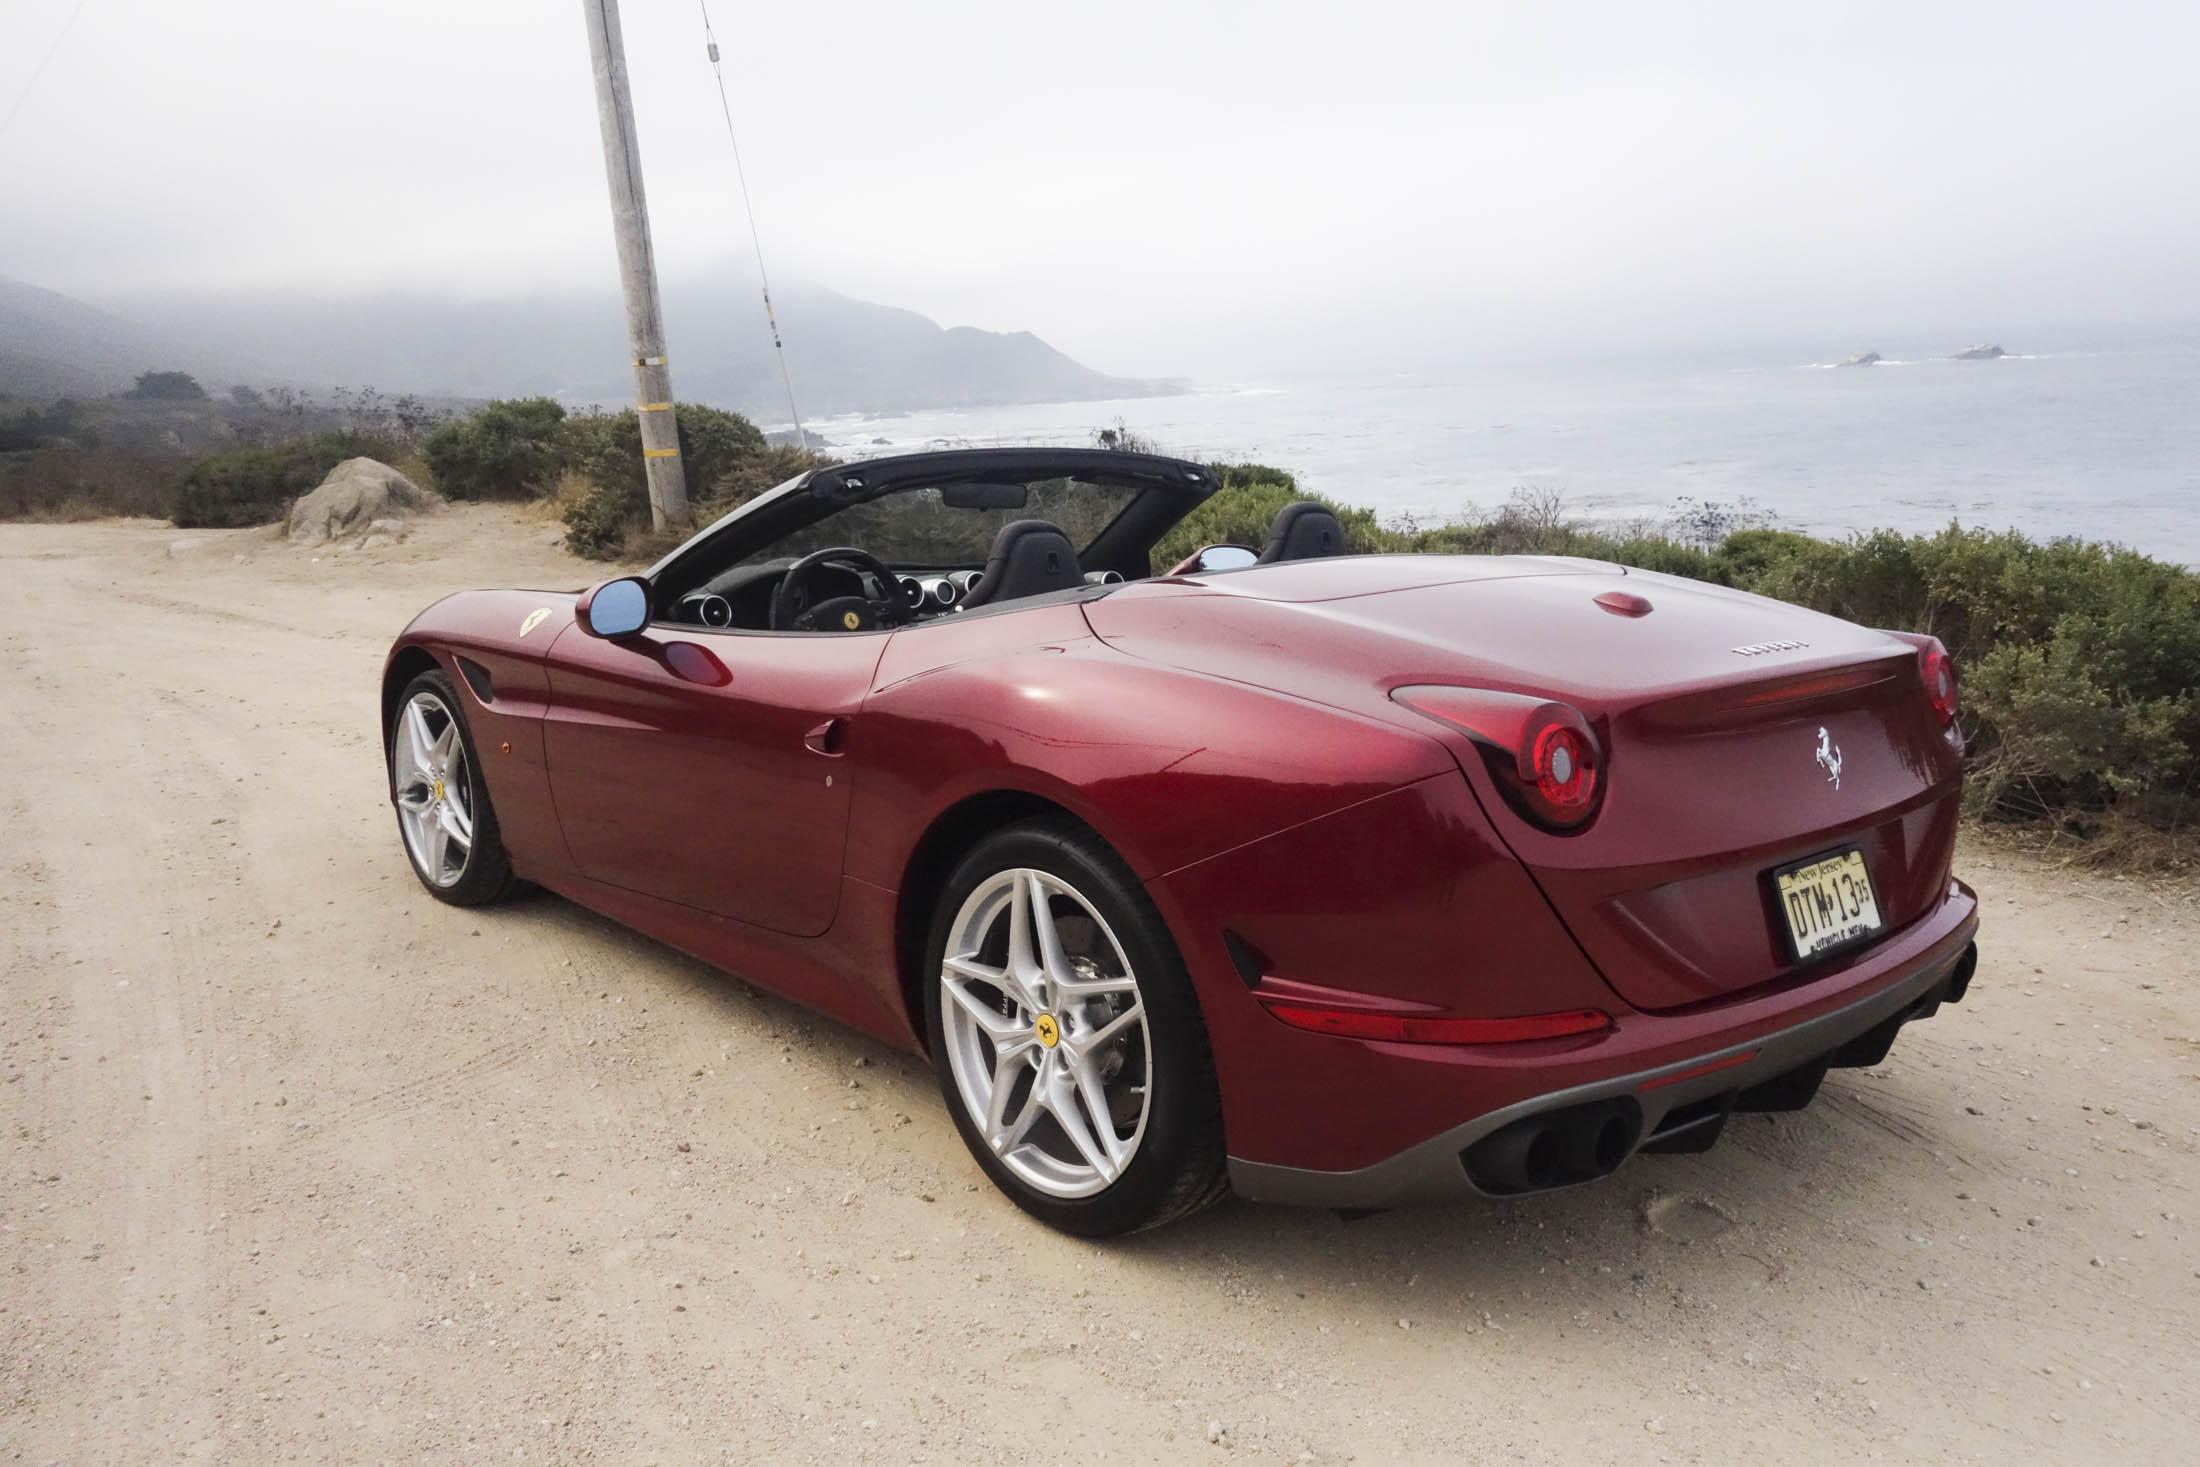 The Practical Supercar: Ferrari California T